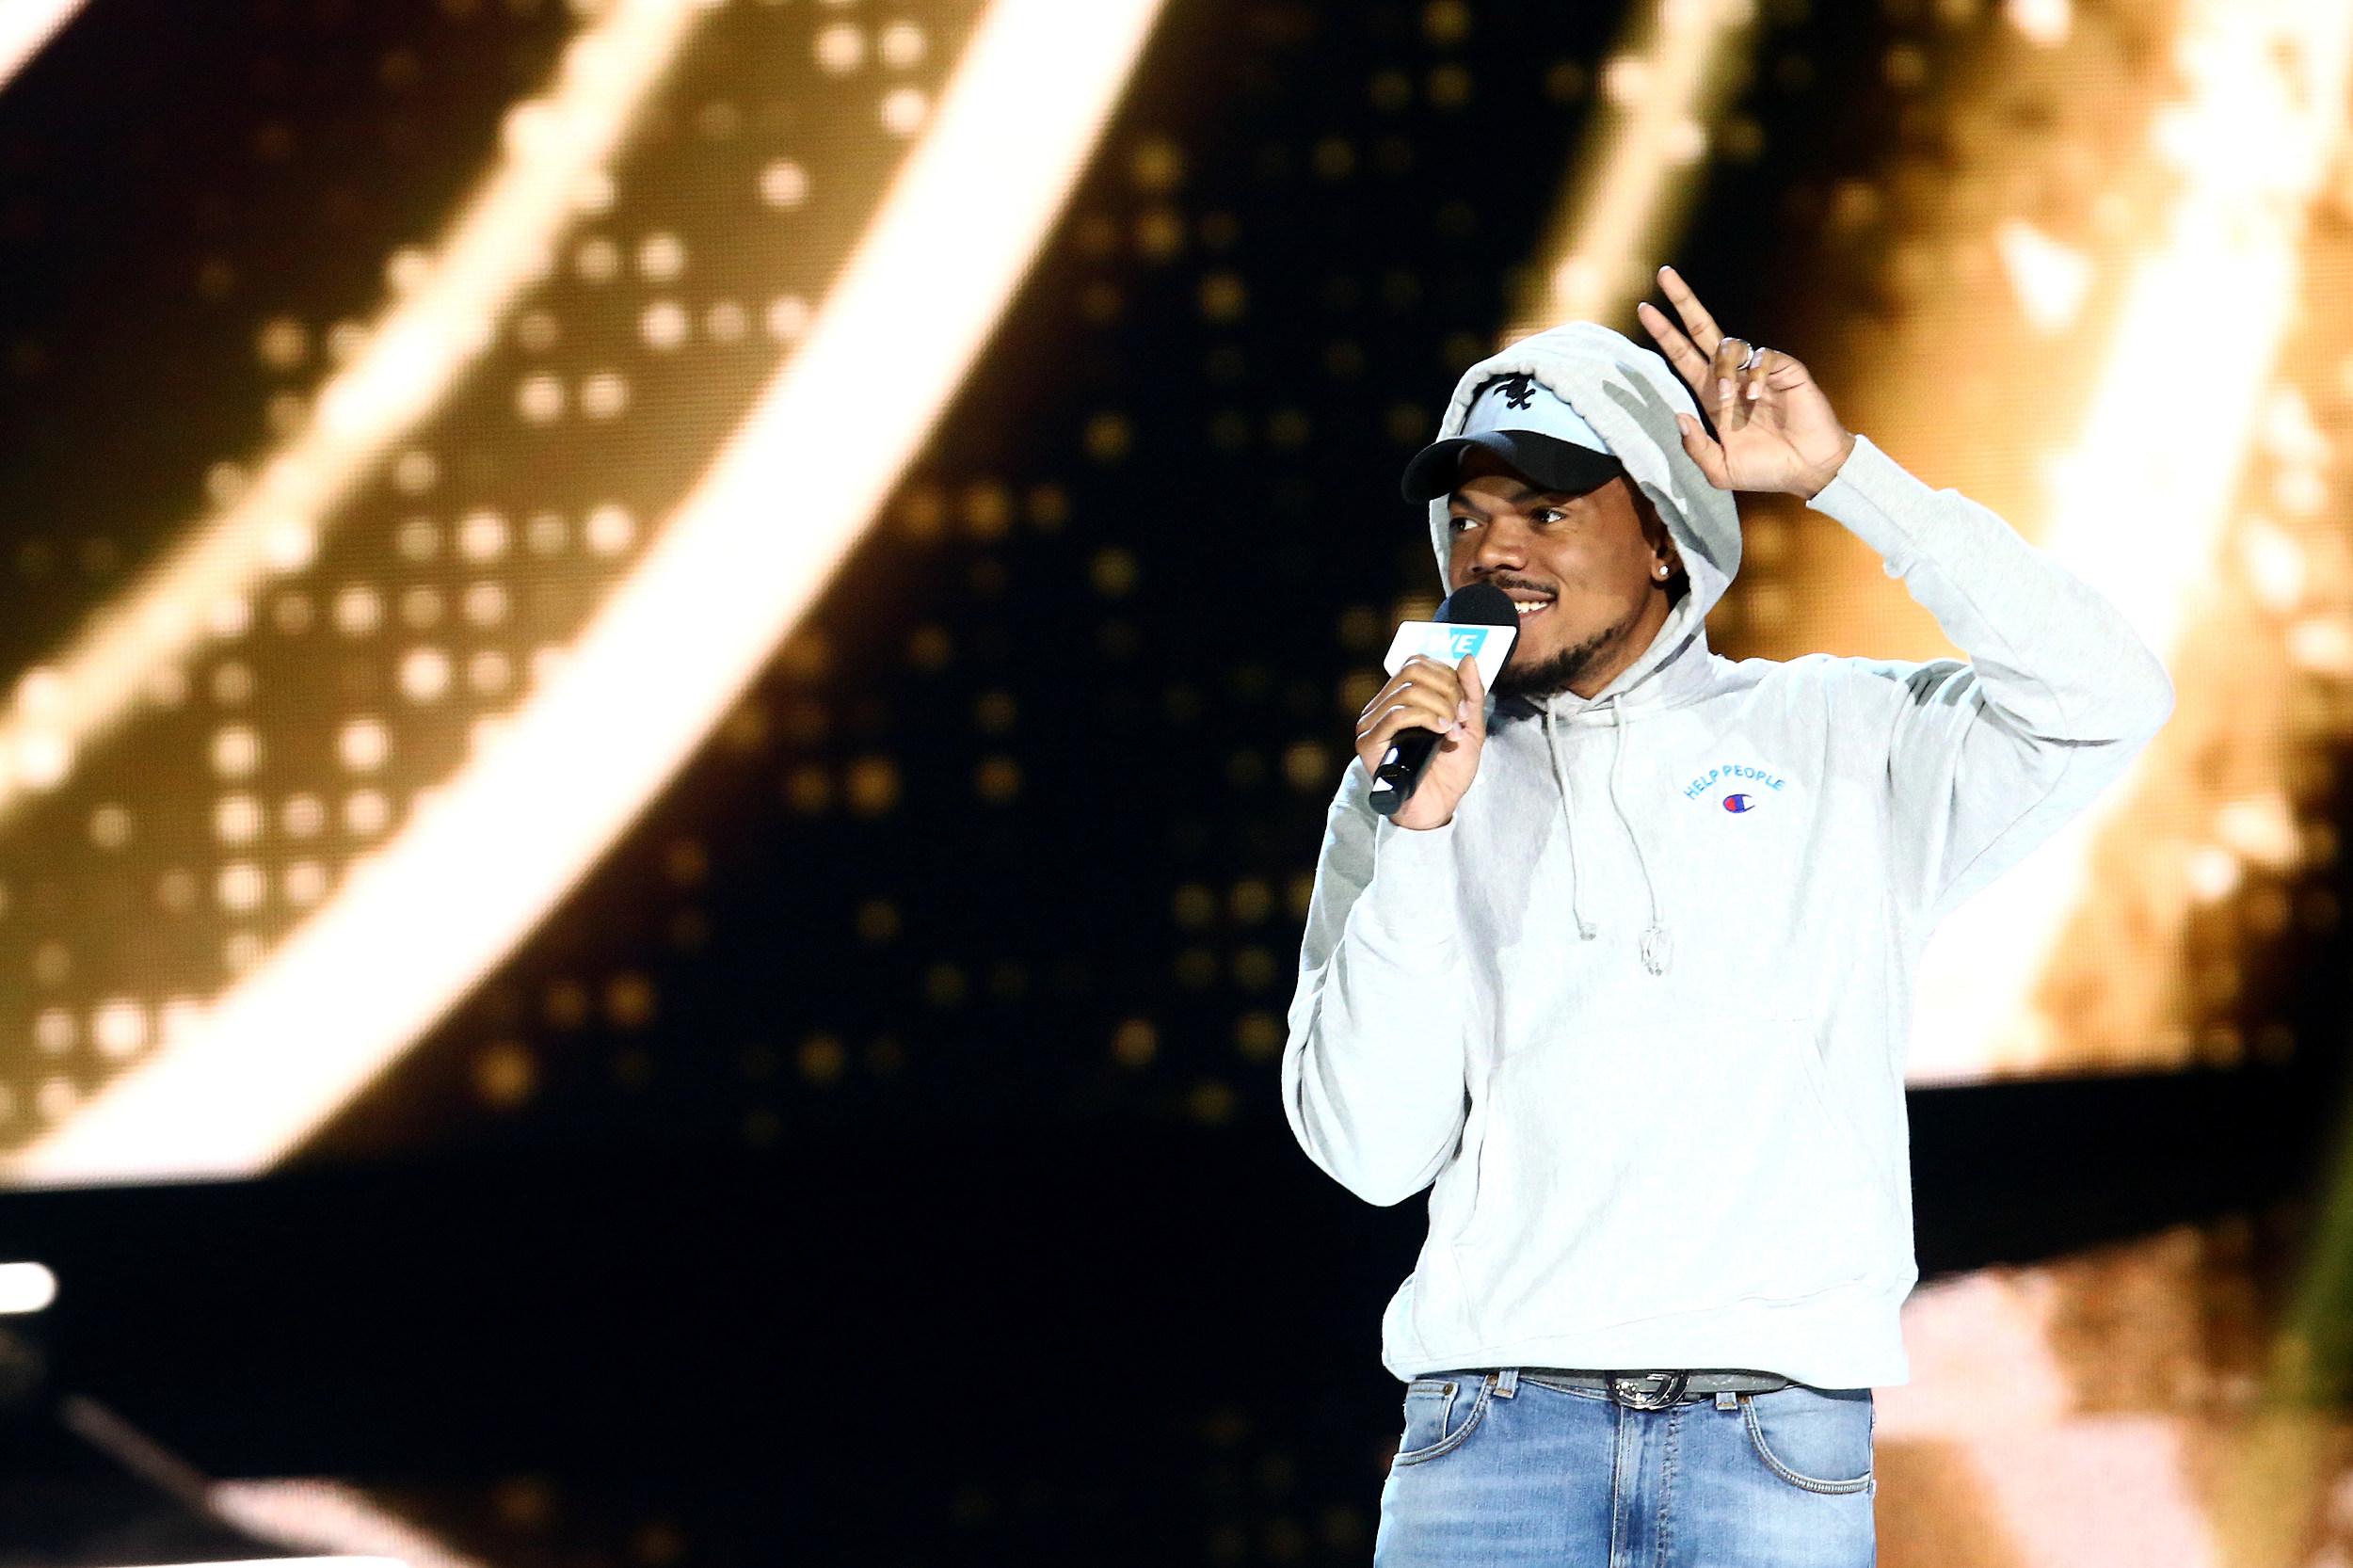 https://townsquare.media/site/812/files/2019/06/chance-the-rapper-2014-freshman.jpg